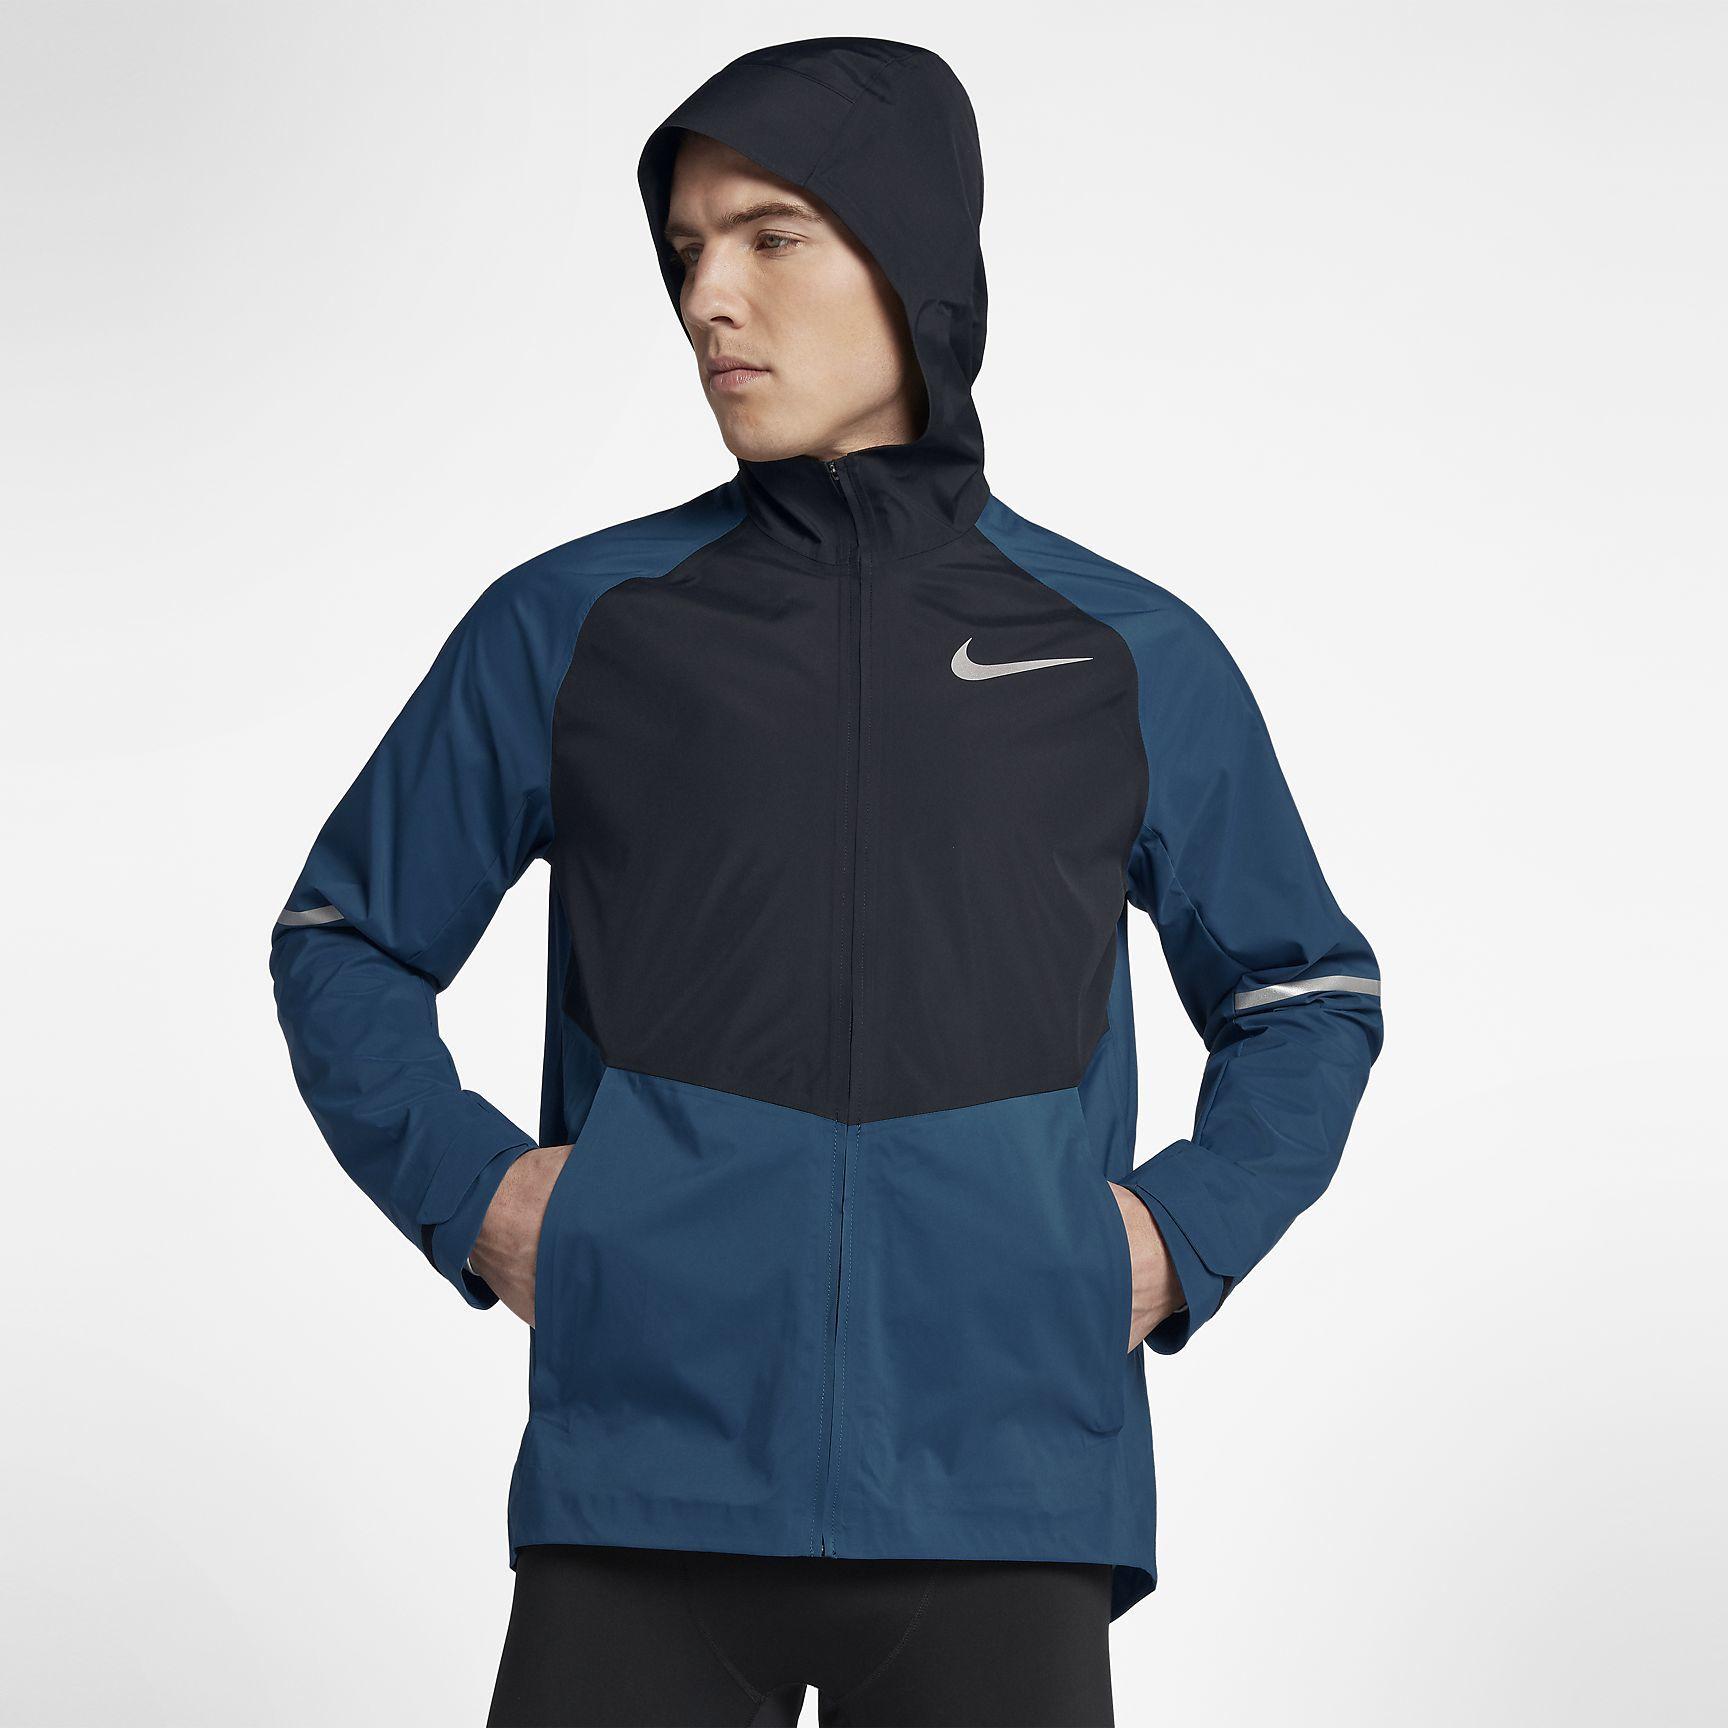 Nike Zonal AeroShield in Blau Schwarz